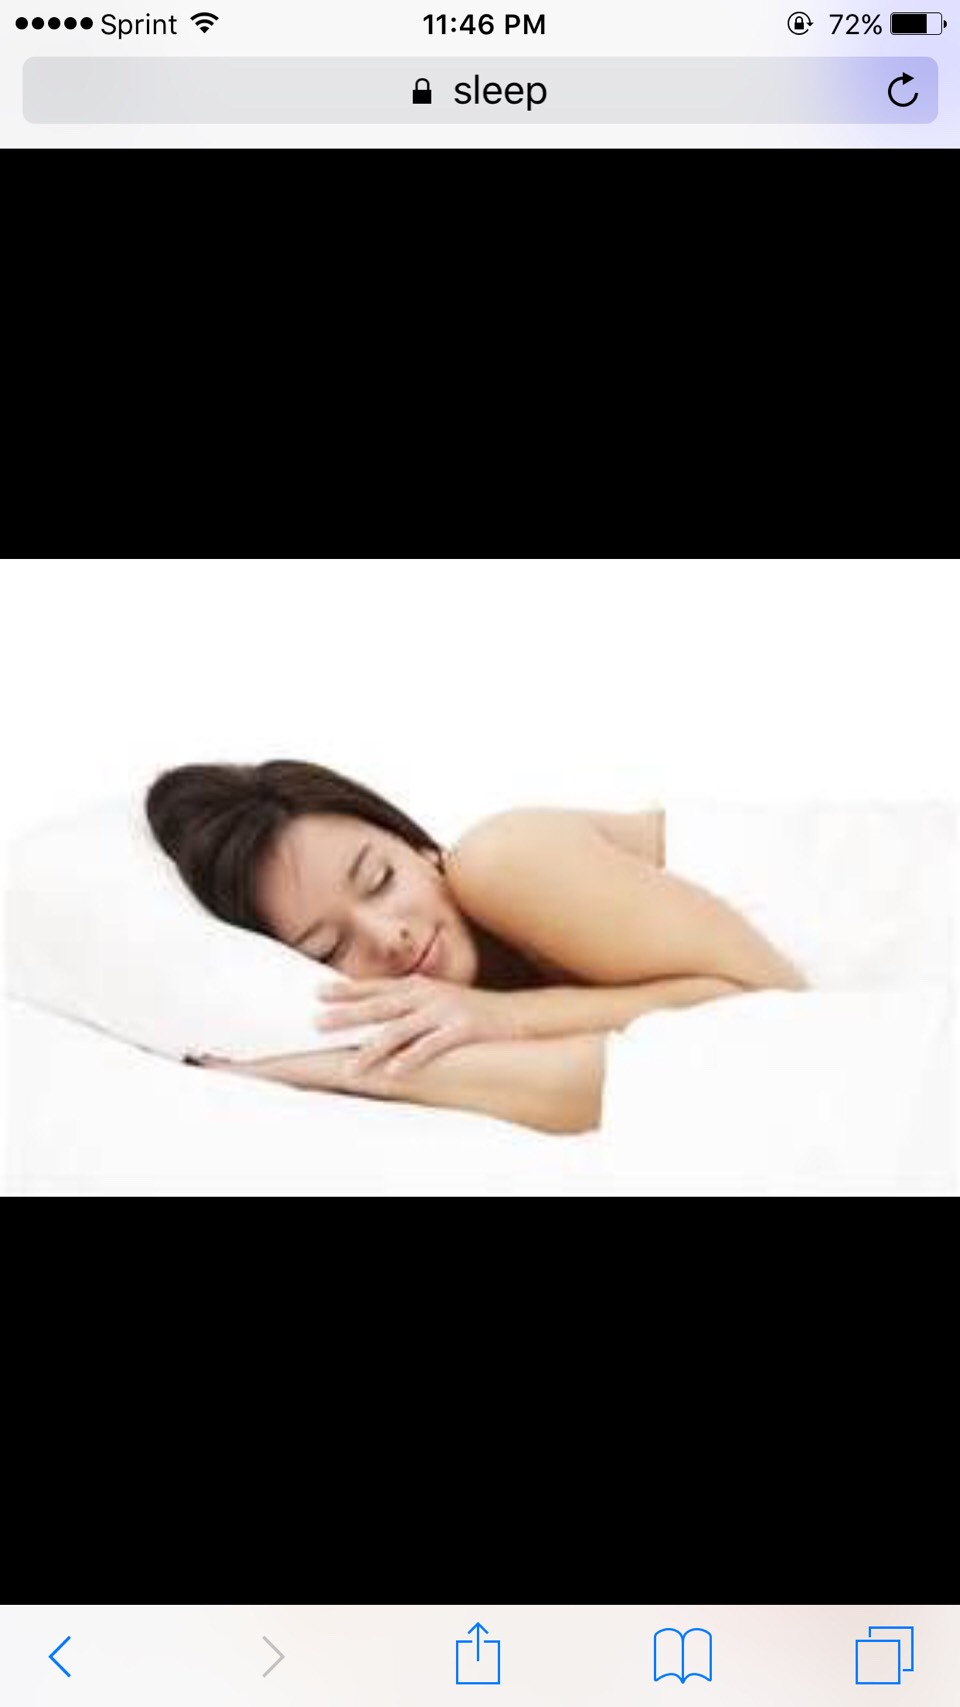 Final step just go to sleep (: